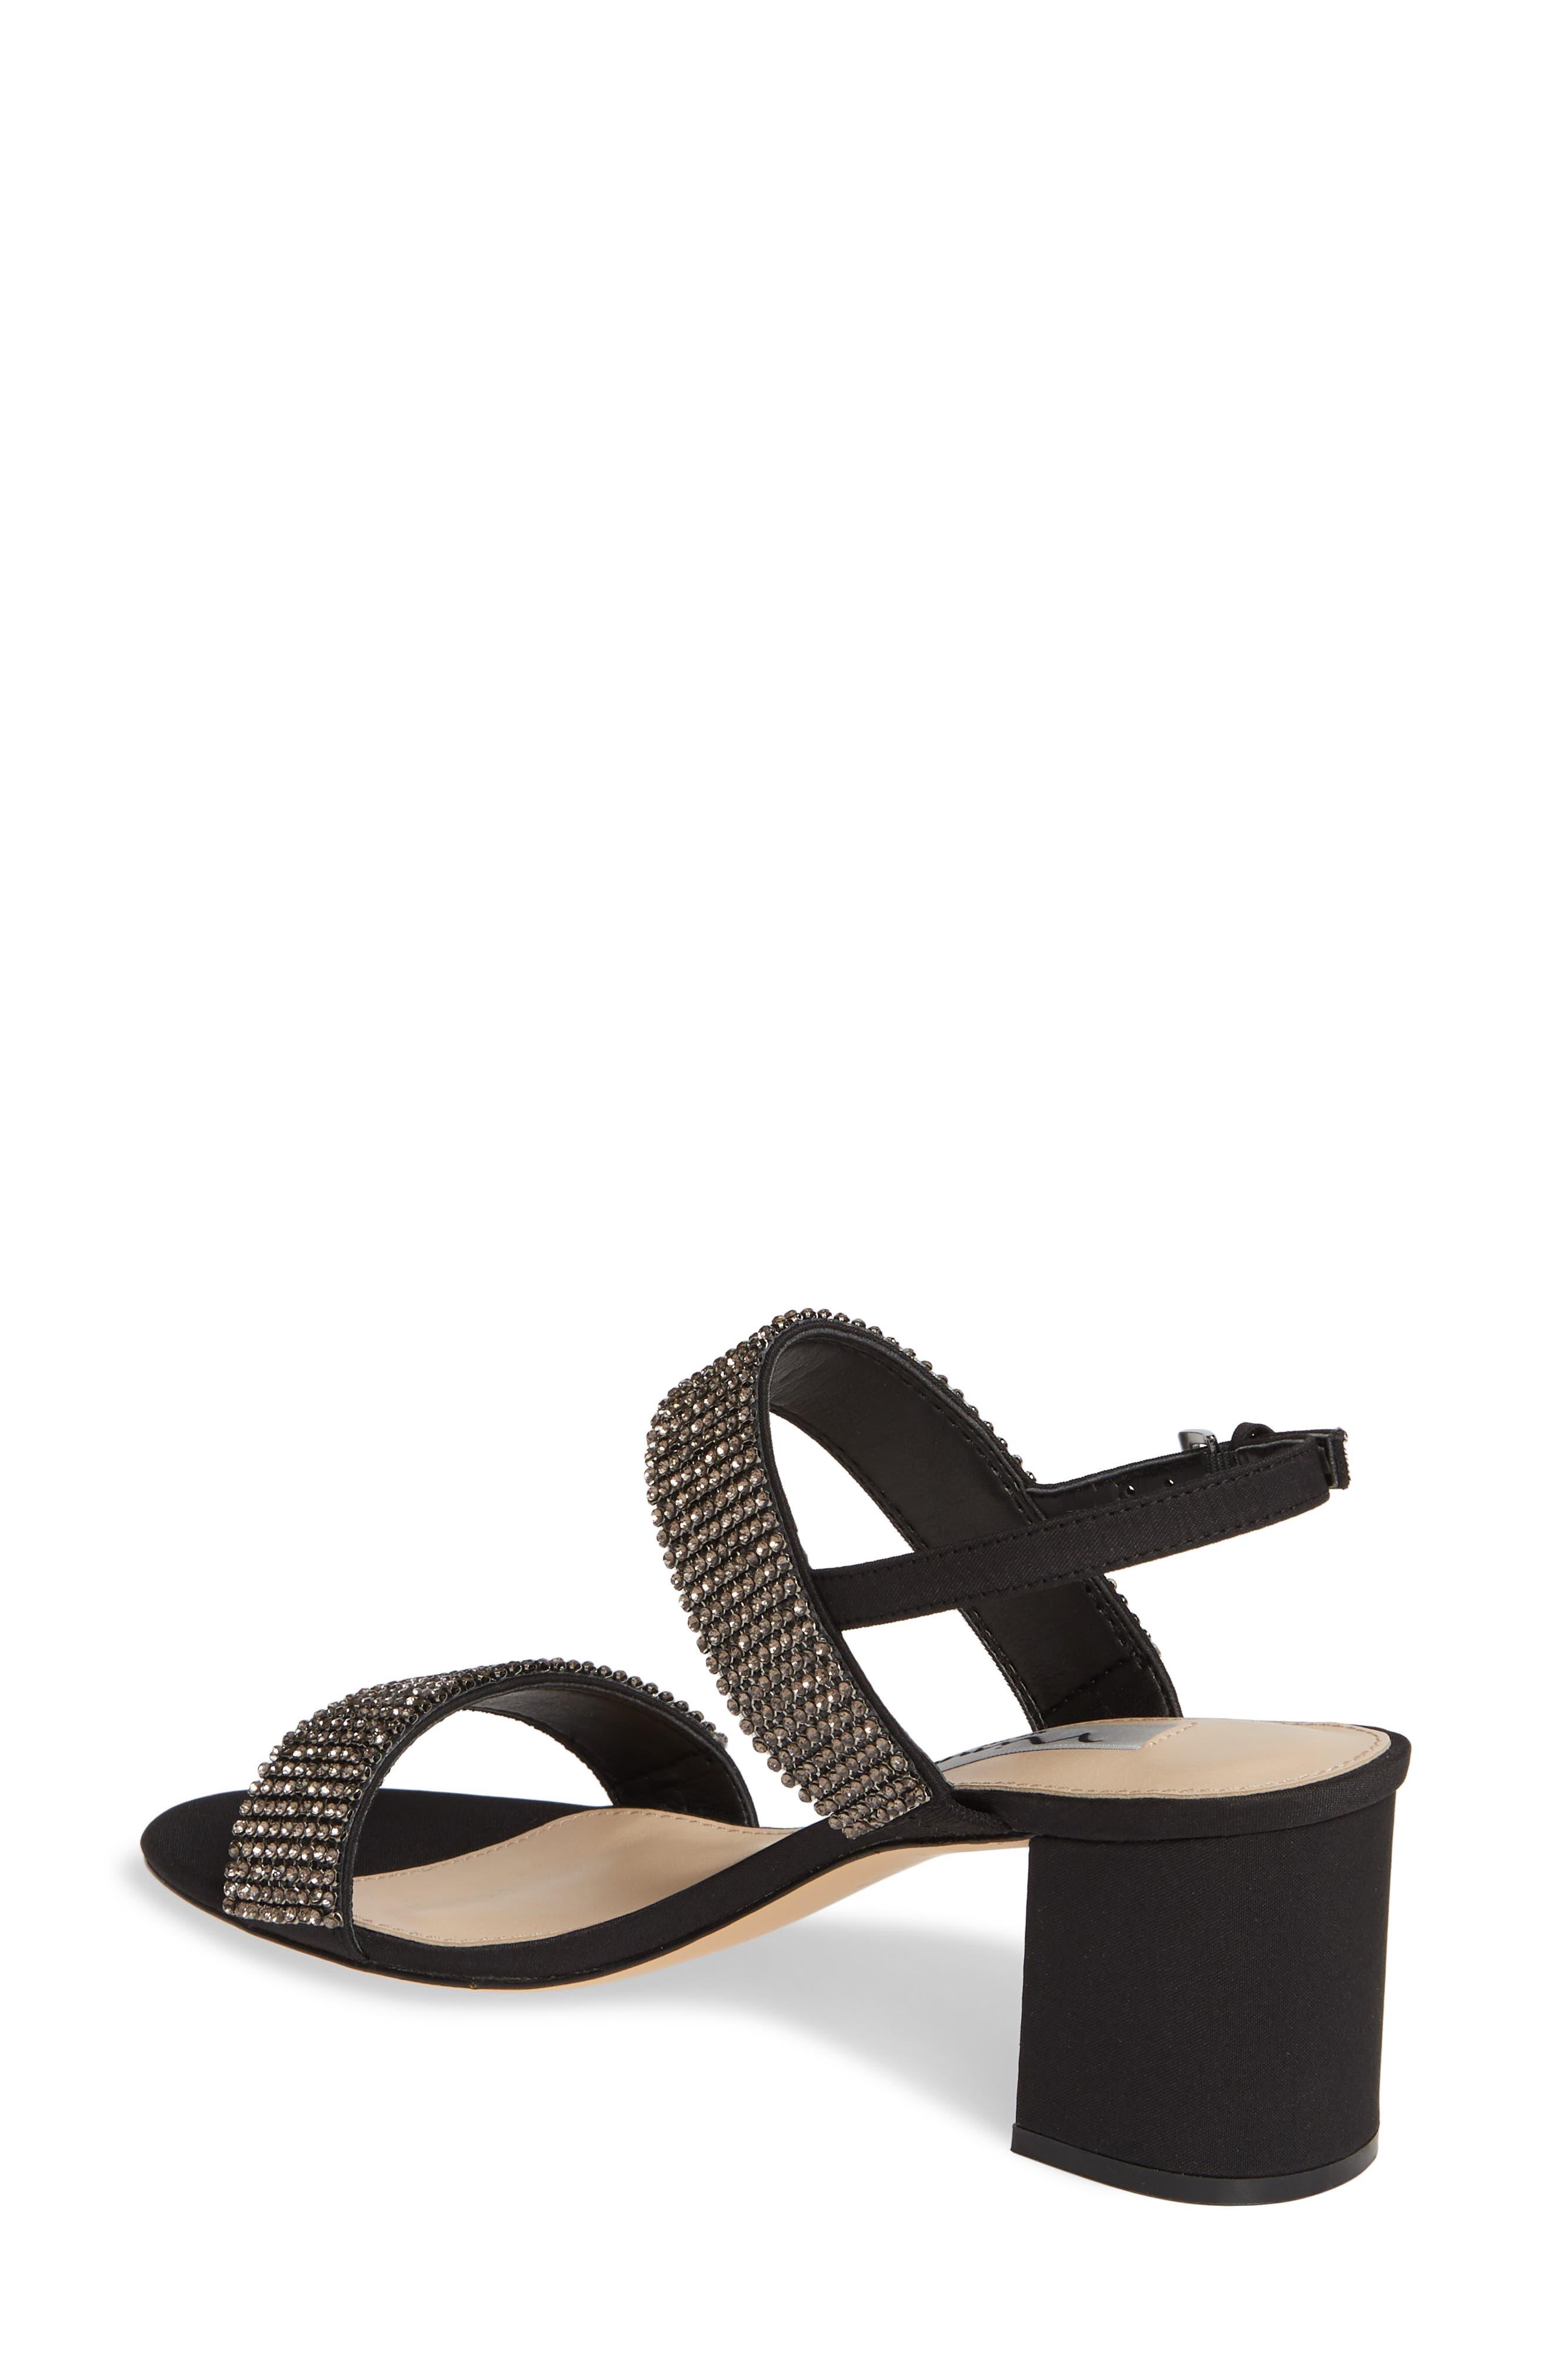 NINA, Naomi Crystal Embellished Sandal, Alternate thumbnail 2, color, BLACK FABRIC